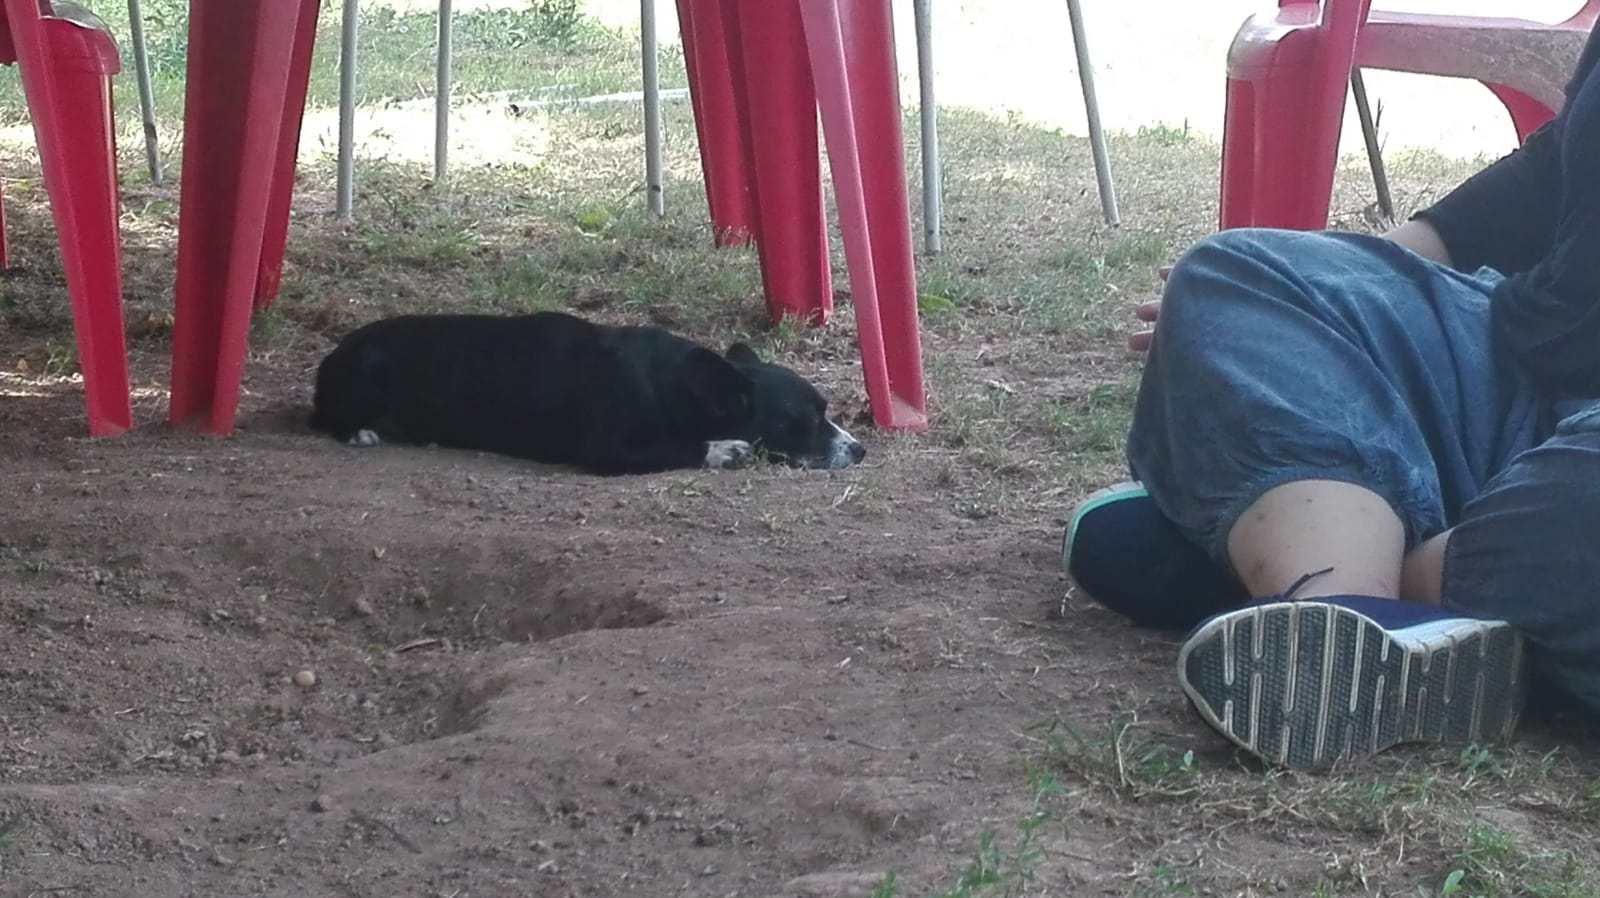 effetto del reiky sui cani Kareen Shiela Ottu